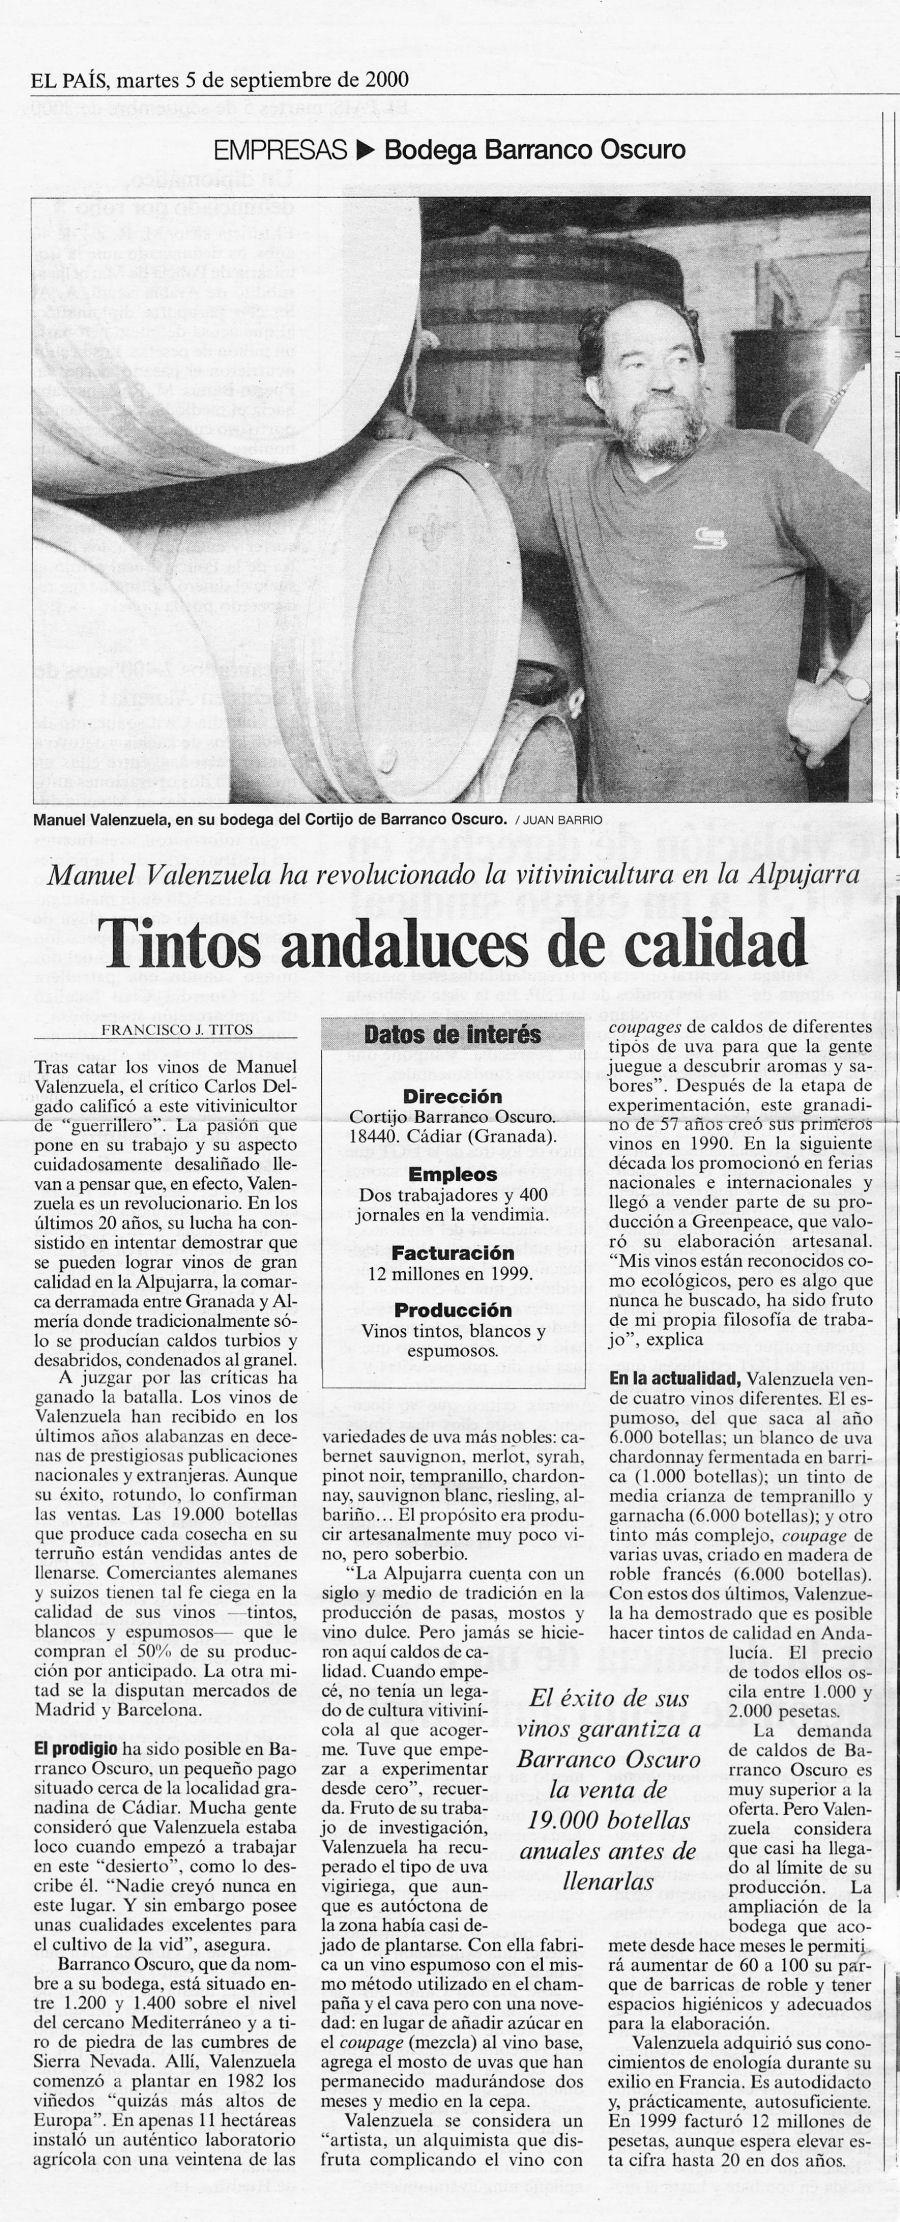 Tintos andaluces de calidad (El Pais, 05/09/2000)